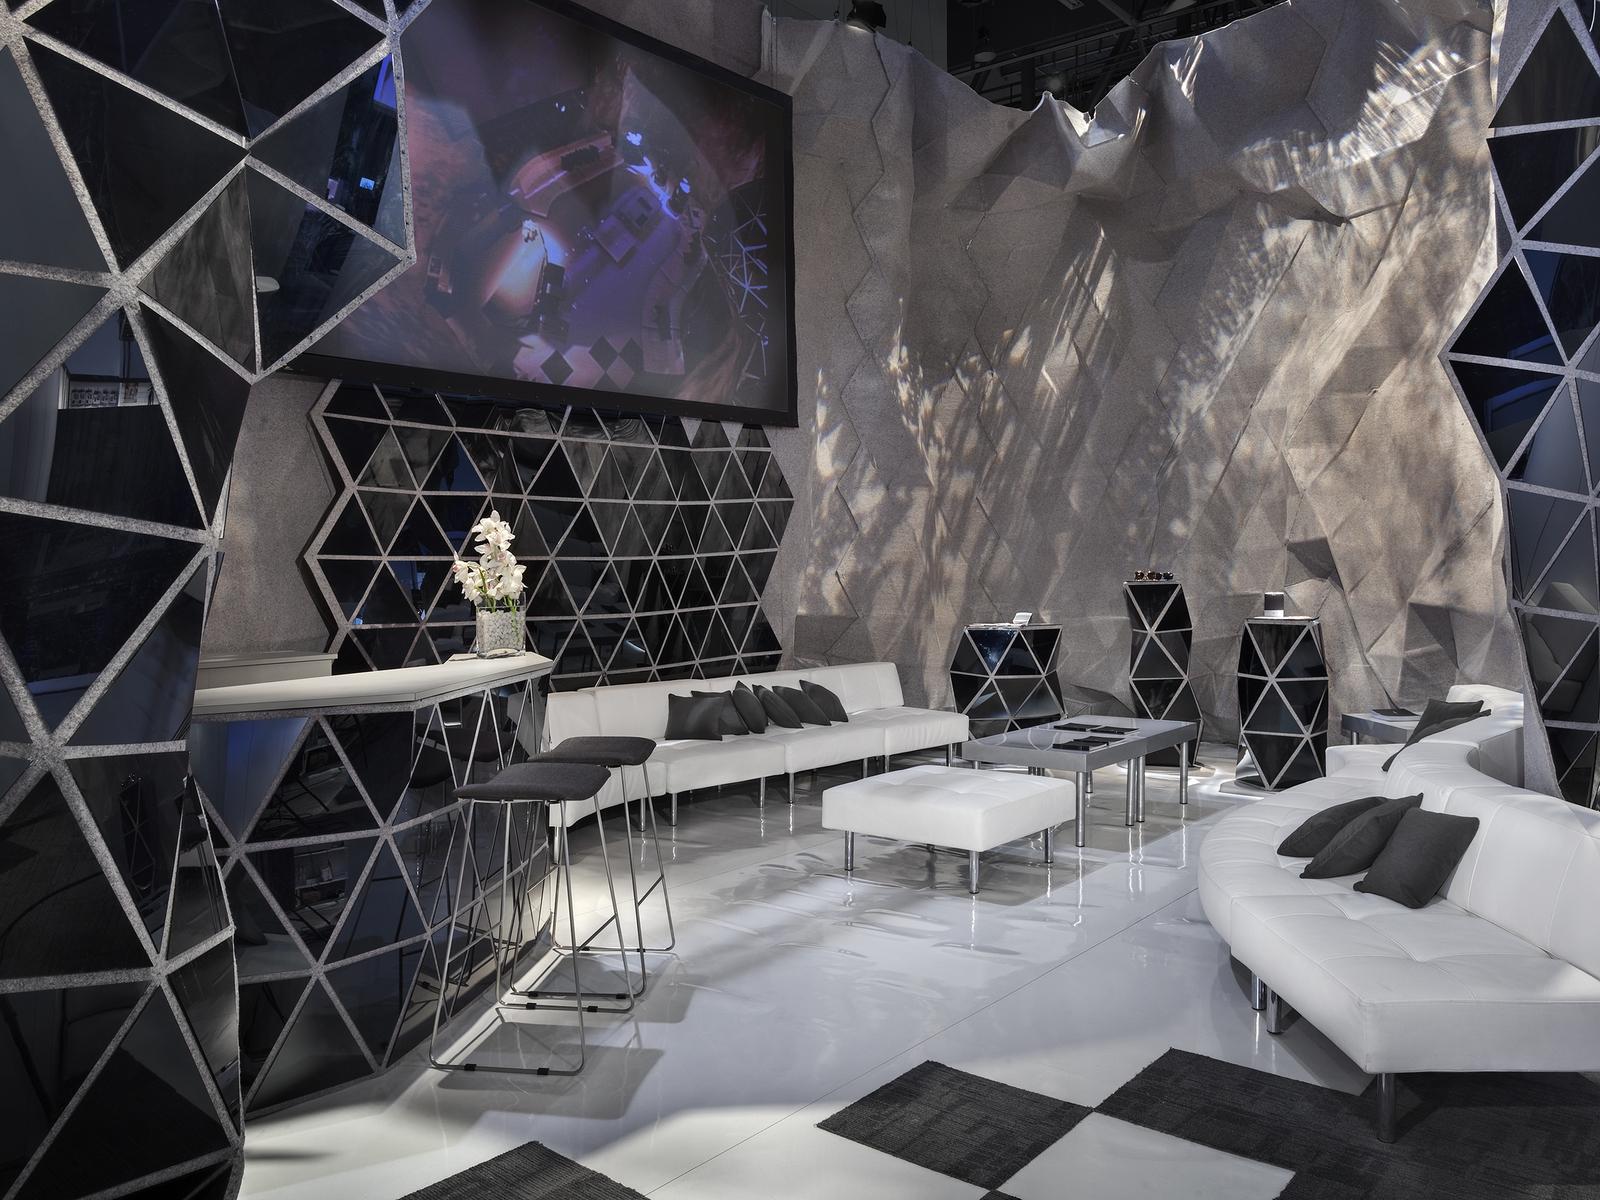 Interior Design Trade Shows exhibit design ideas & inspiration - trade show displays